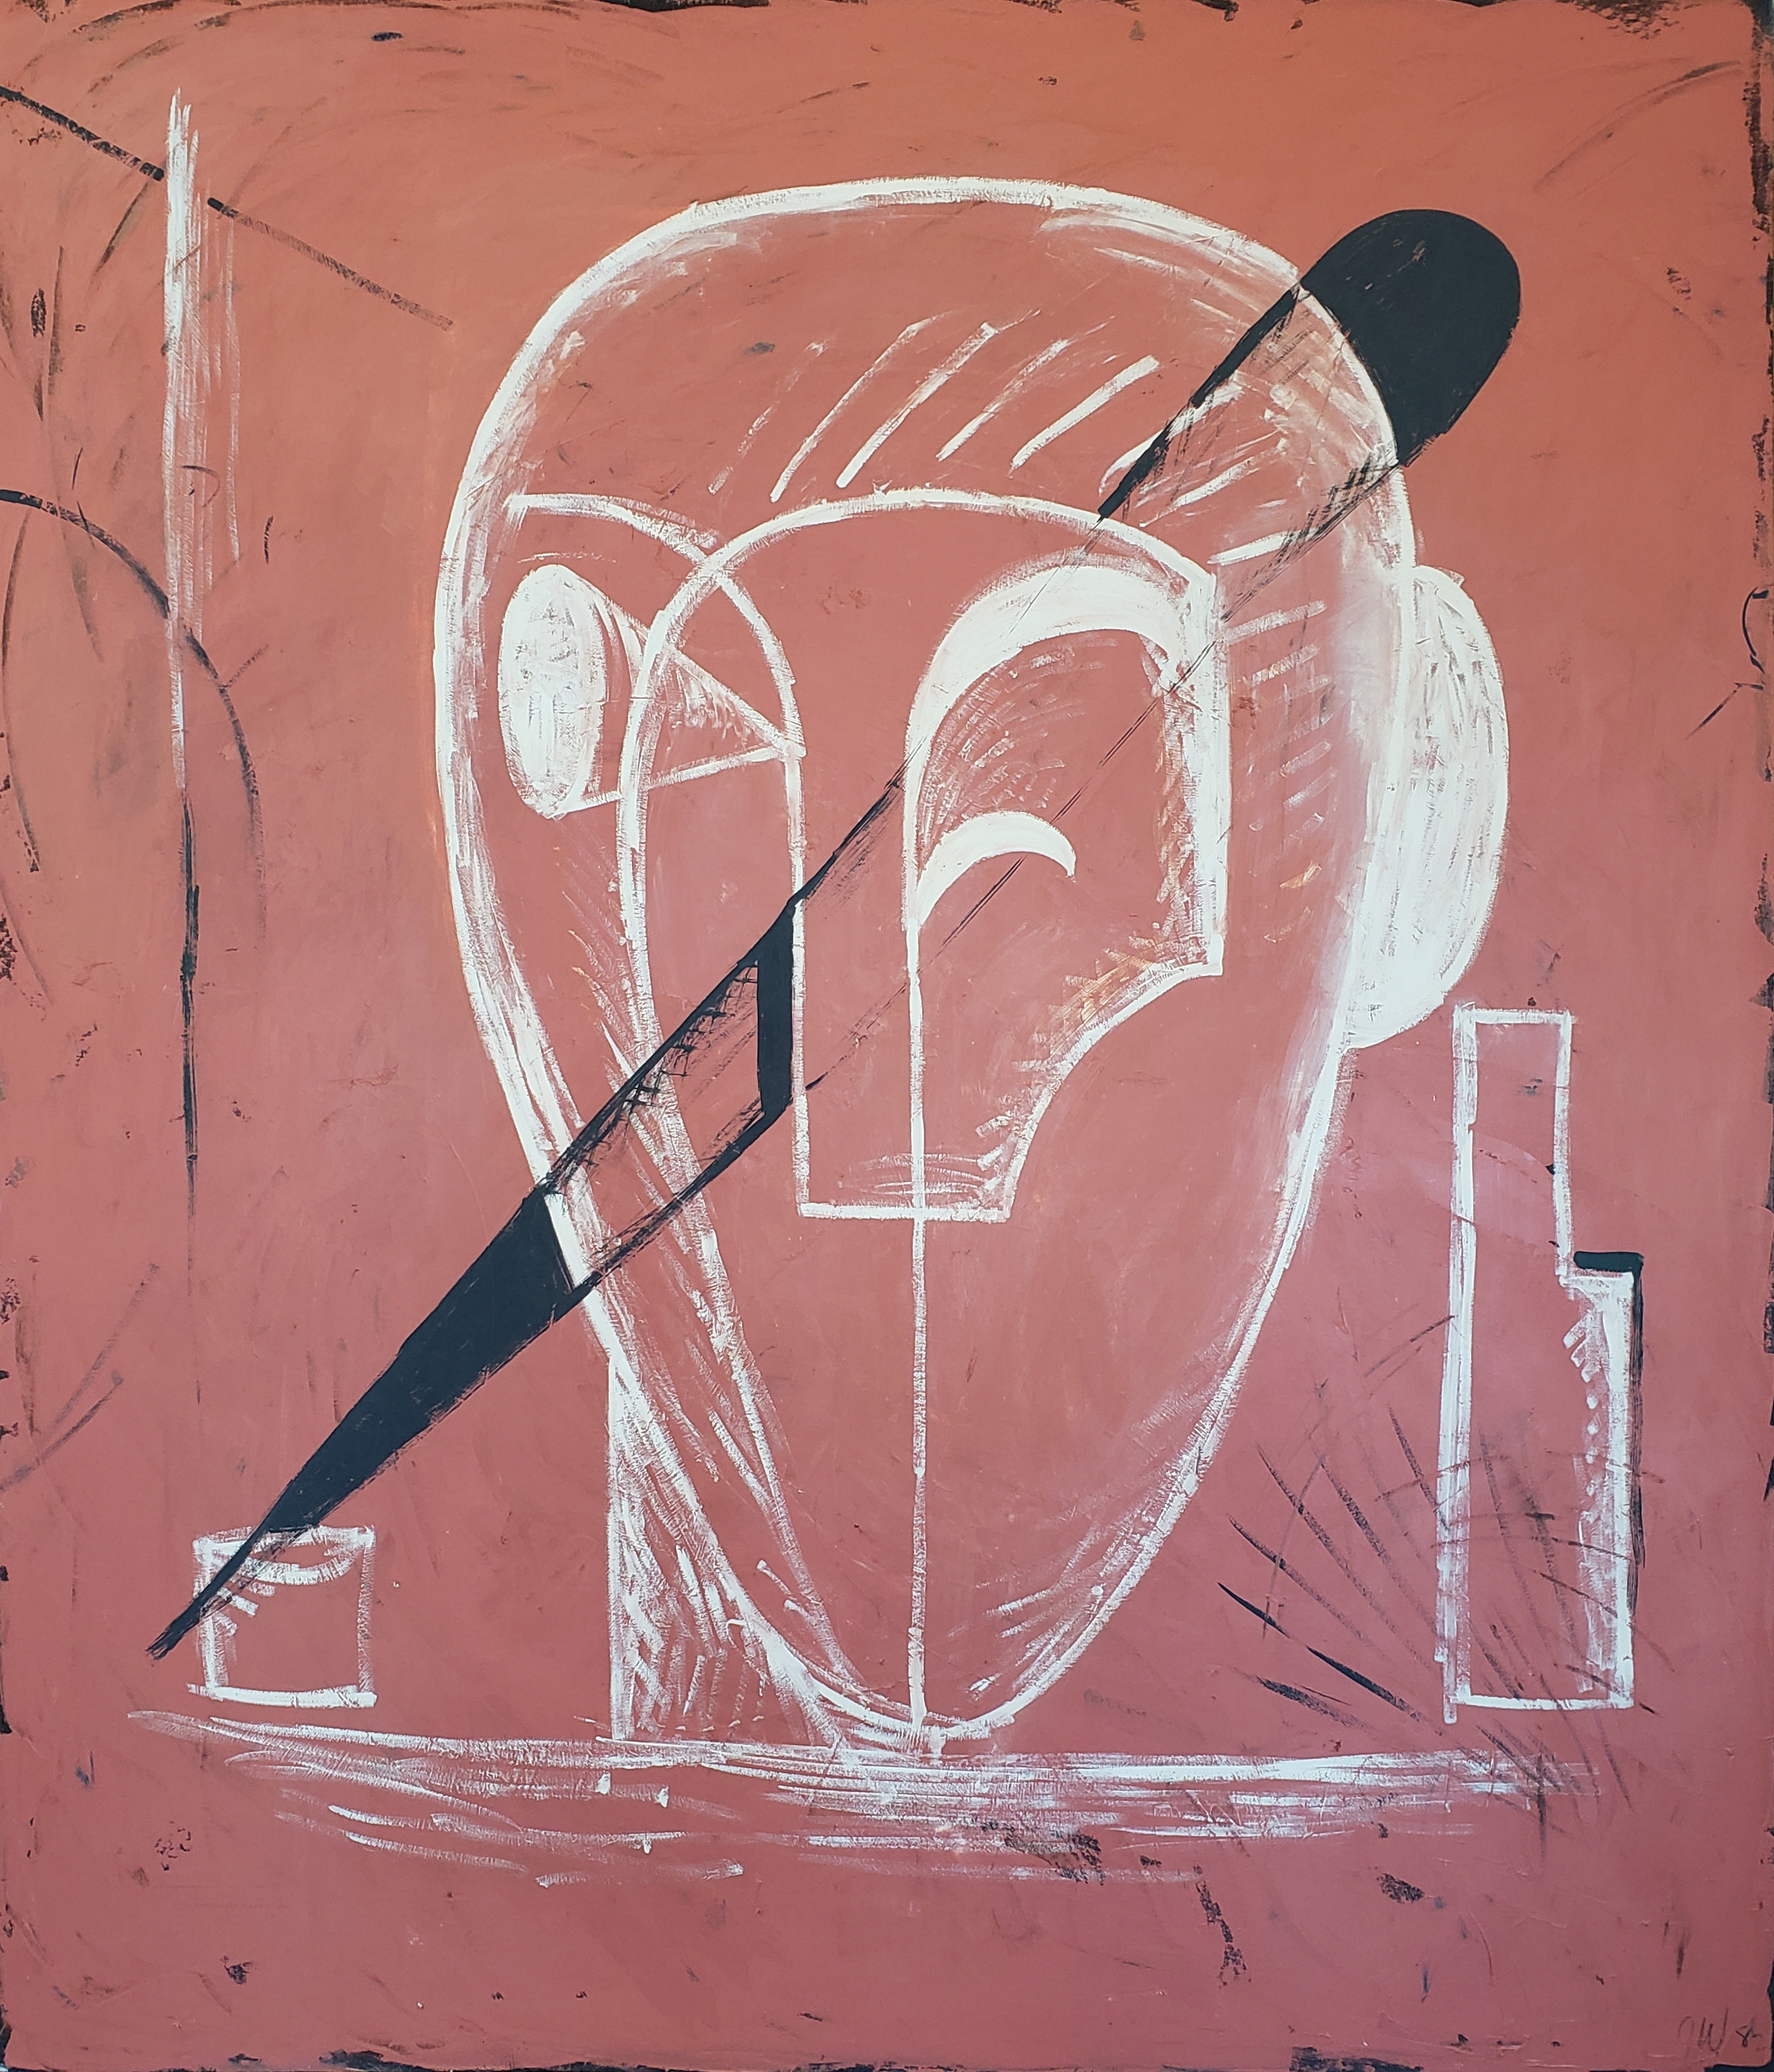 Jonathan Waite - Twentieth Century